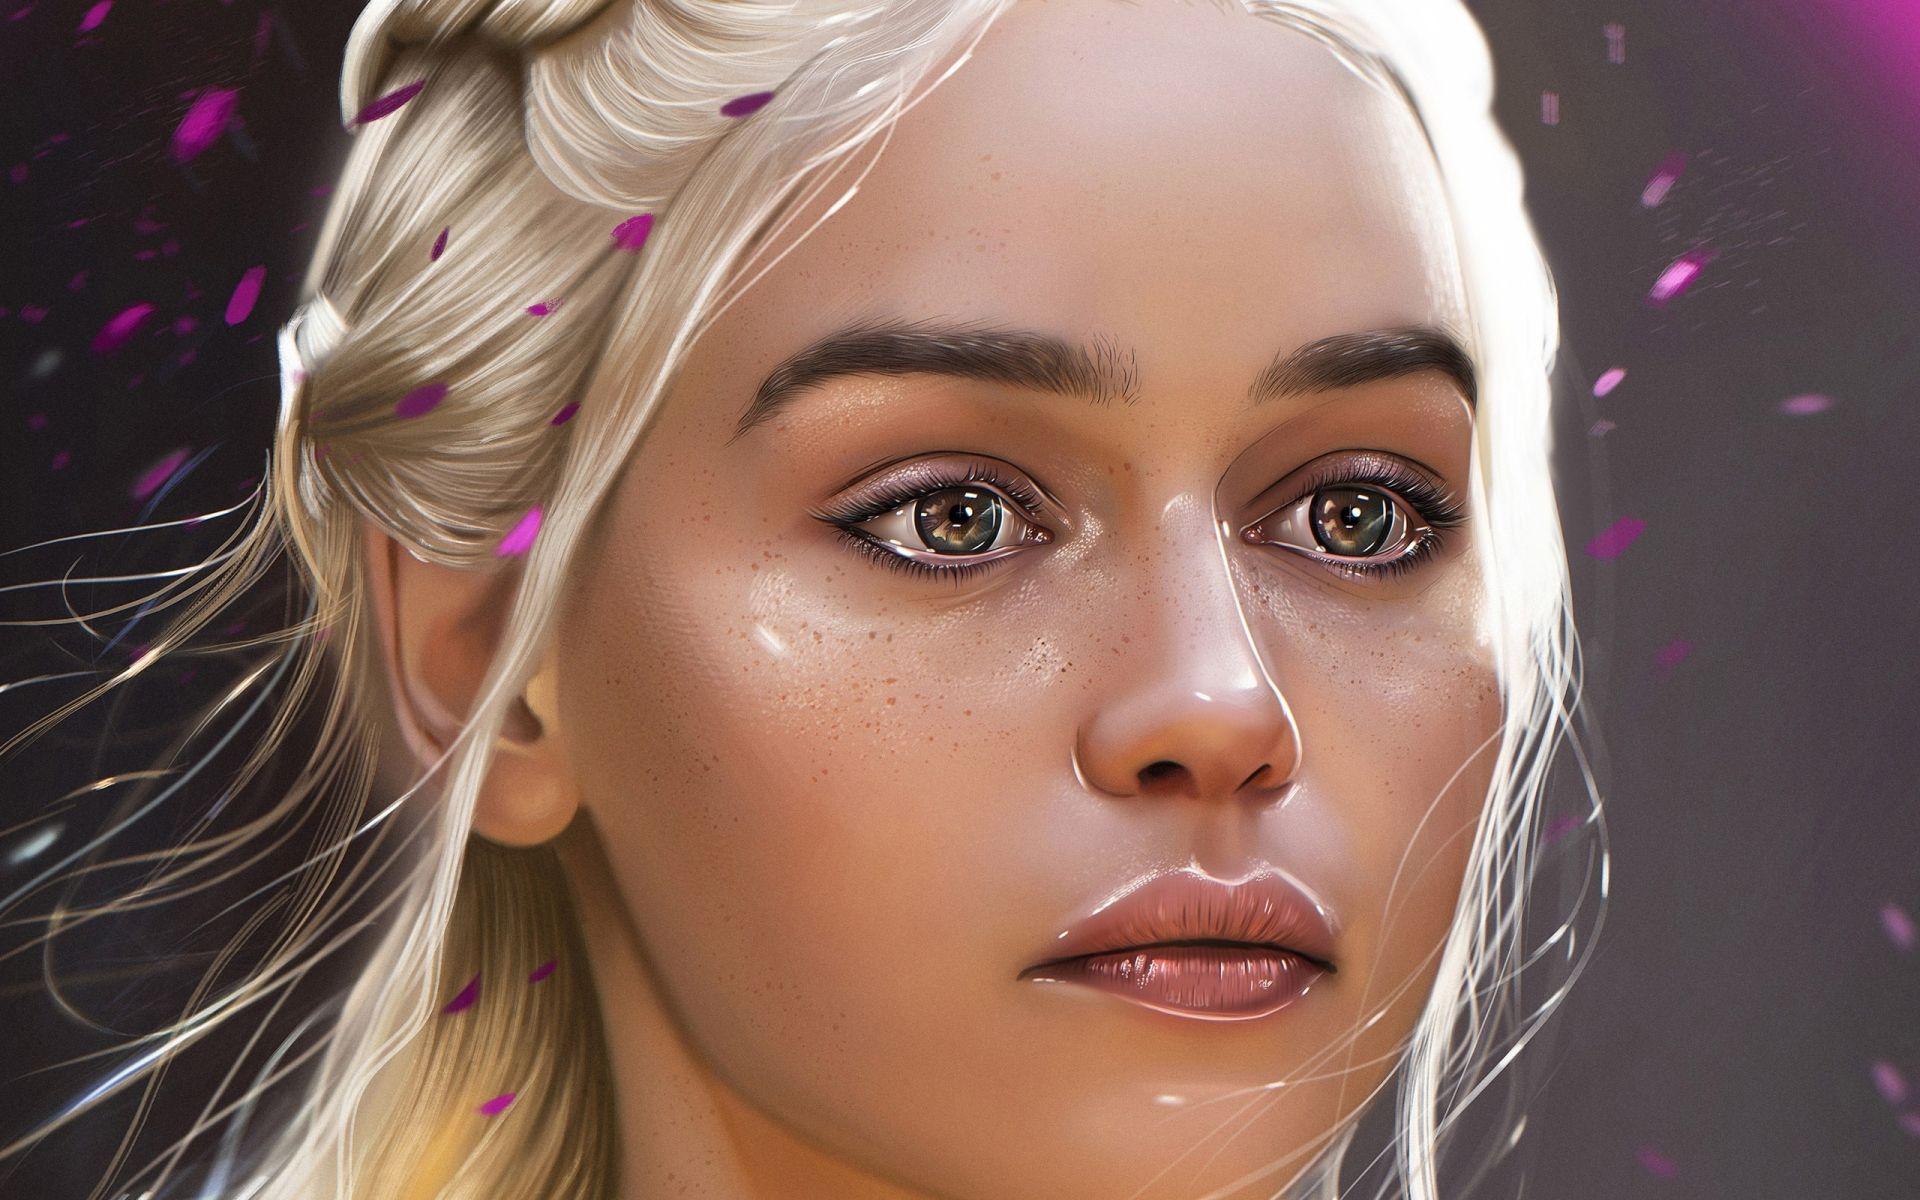 Game of Thrones Daenerys Targaryen face art